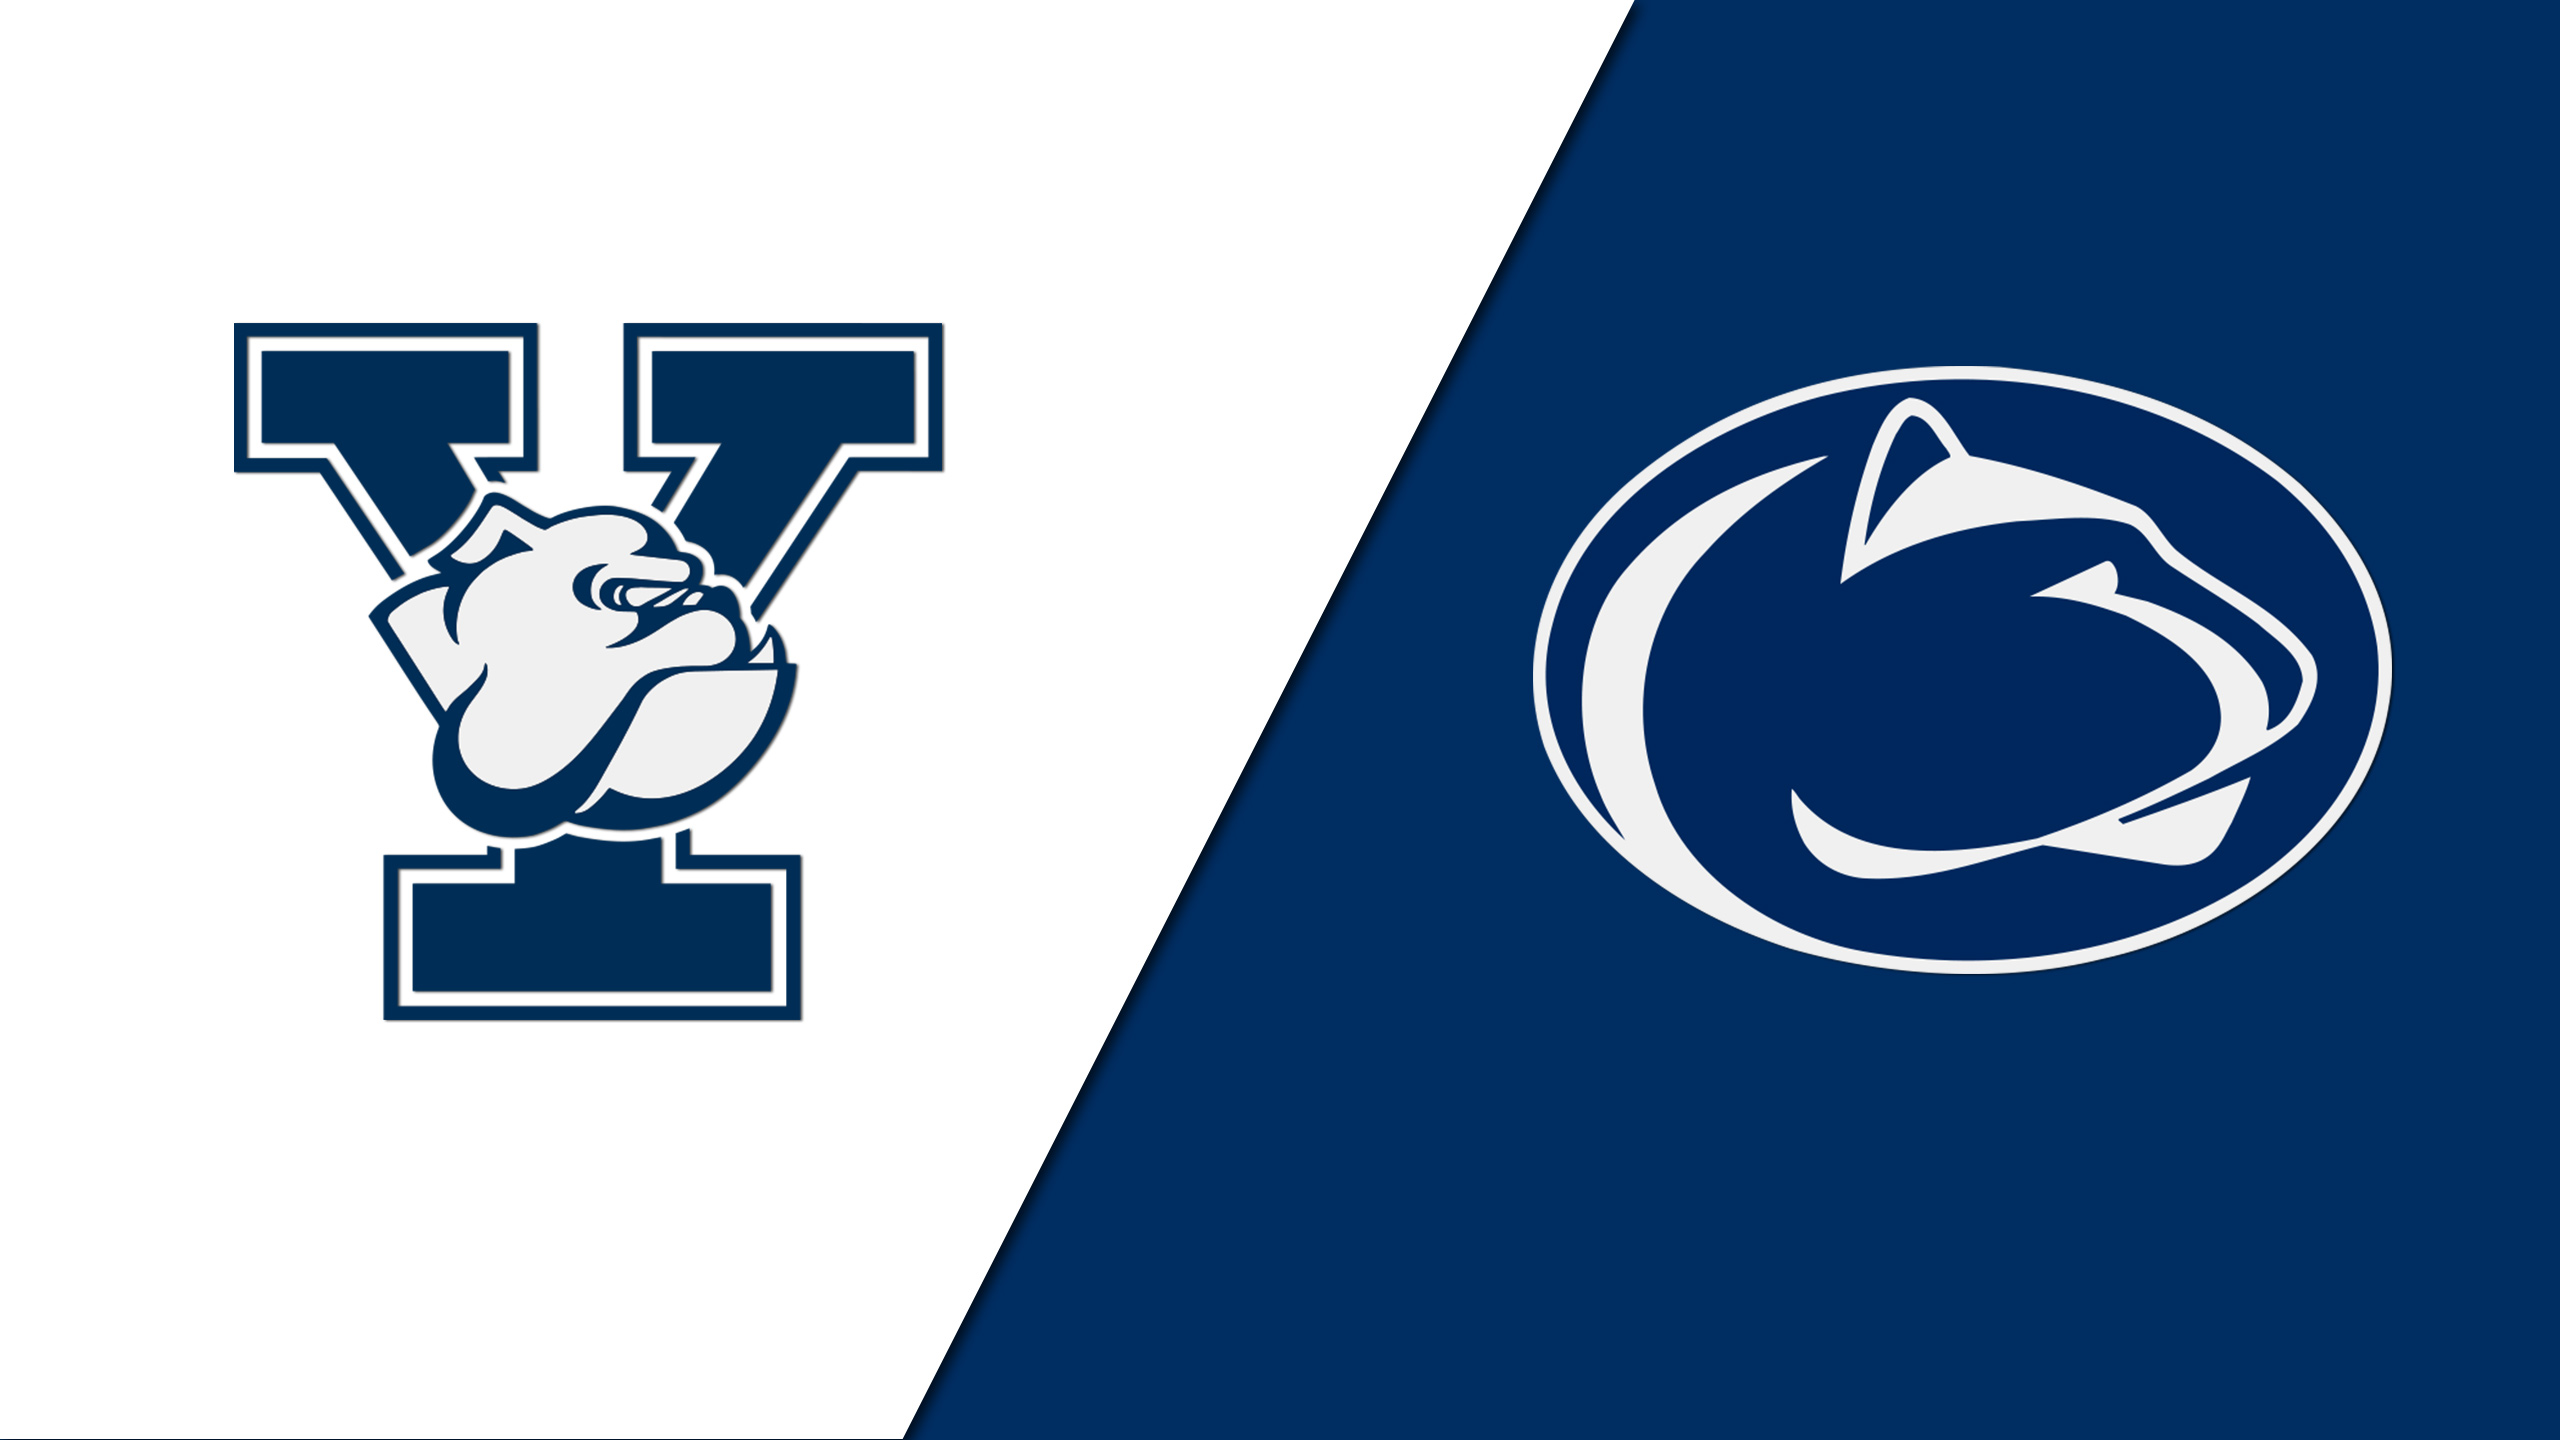 #5 Yale vs. #1 Penn State (Semifinal #2)